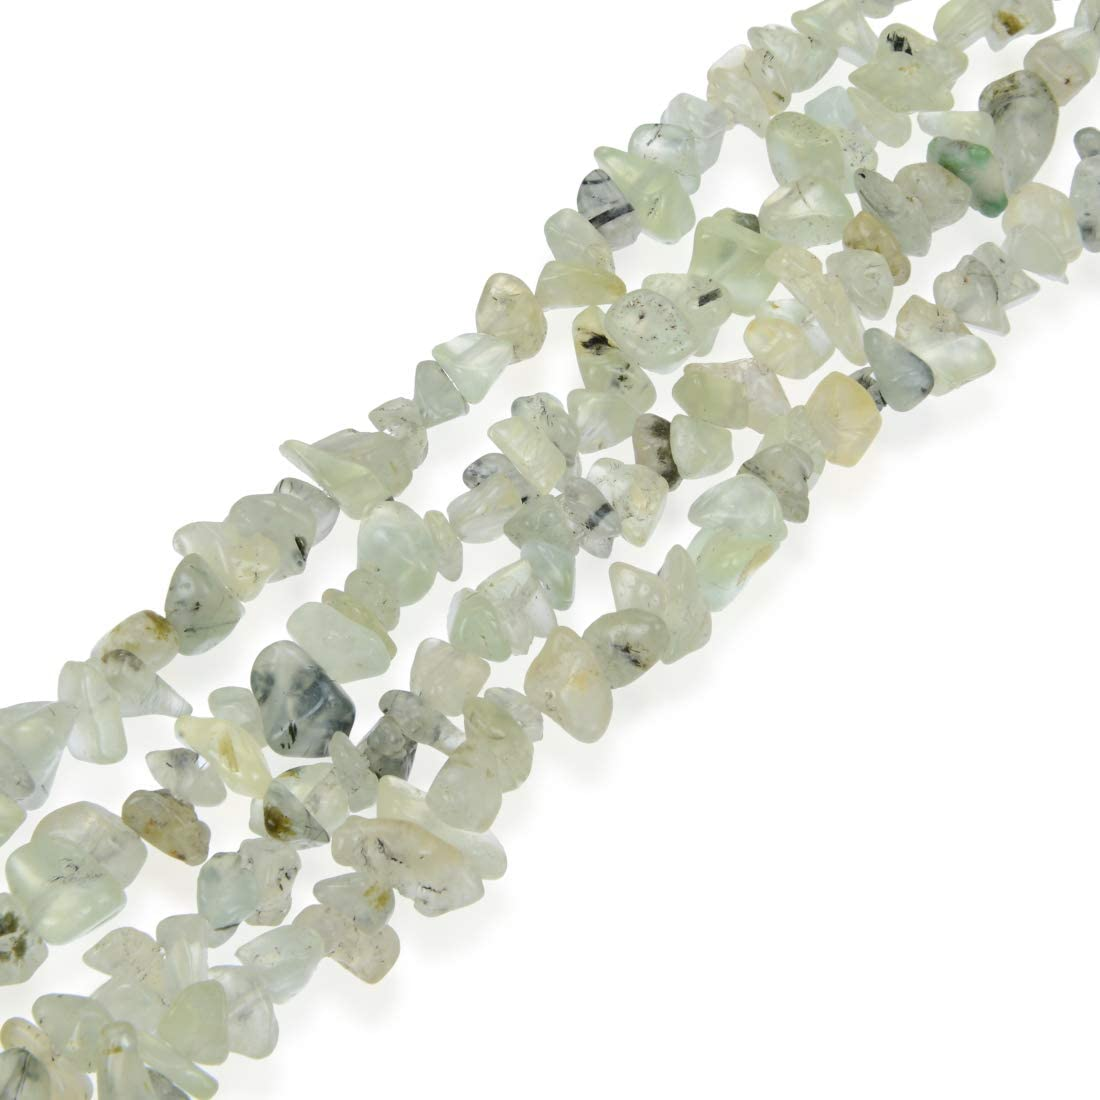 Genuine Natural Rock Crystal Quartz Rectangular Shaped Beads Gemstones 4-8mm 12pcs